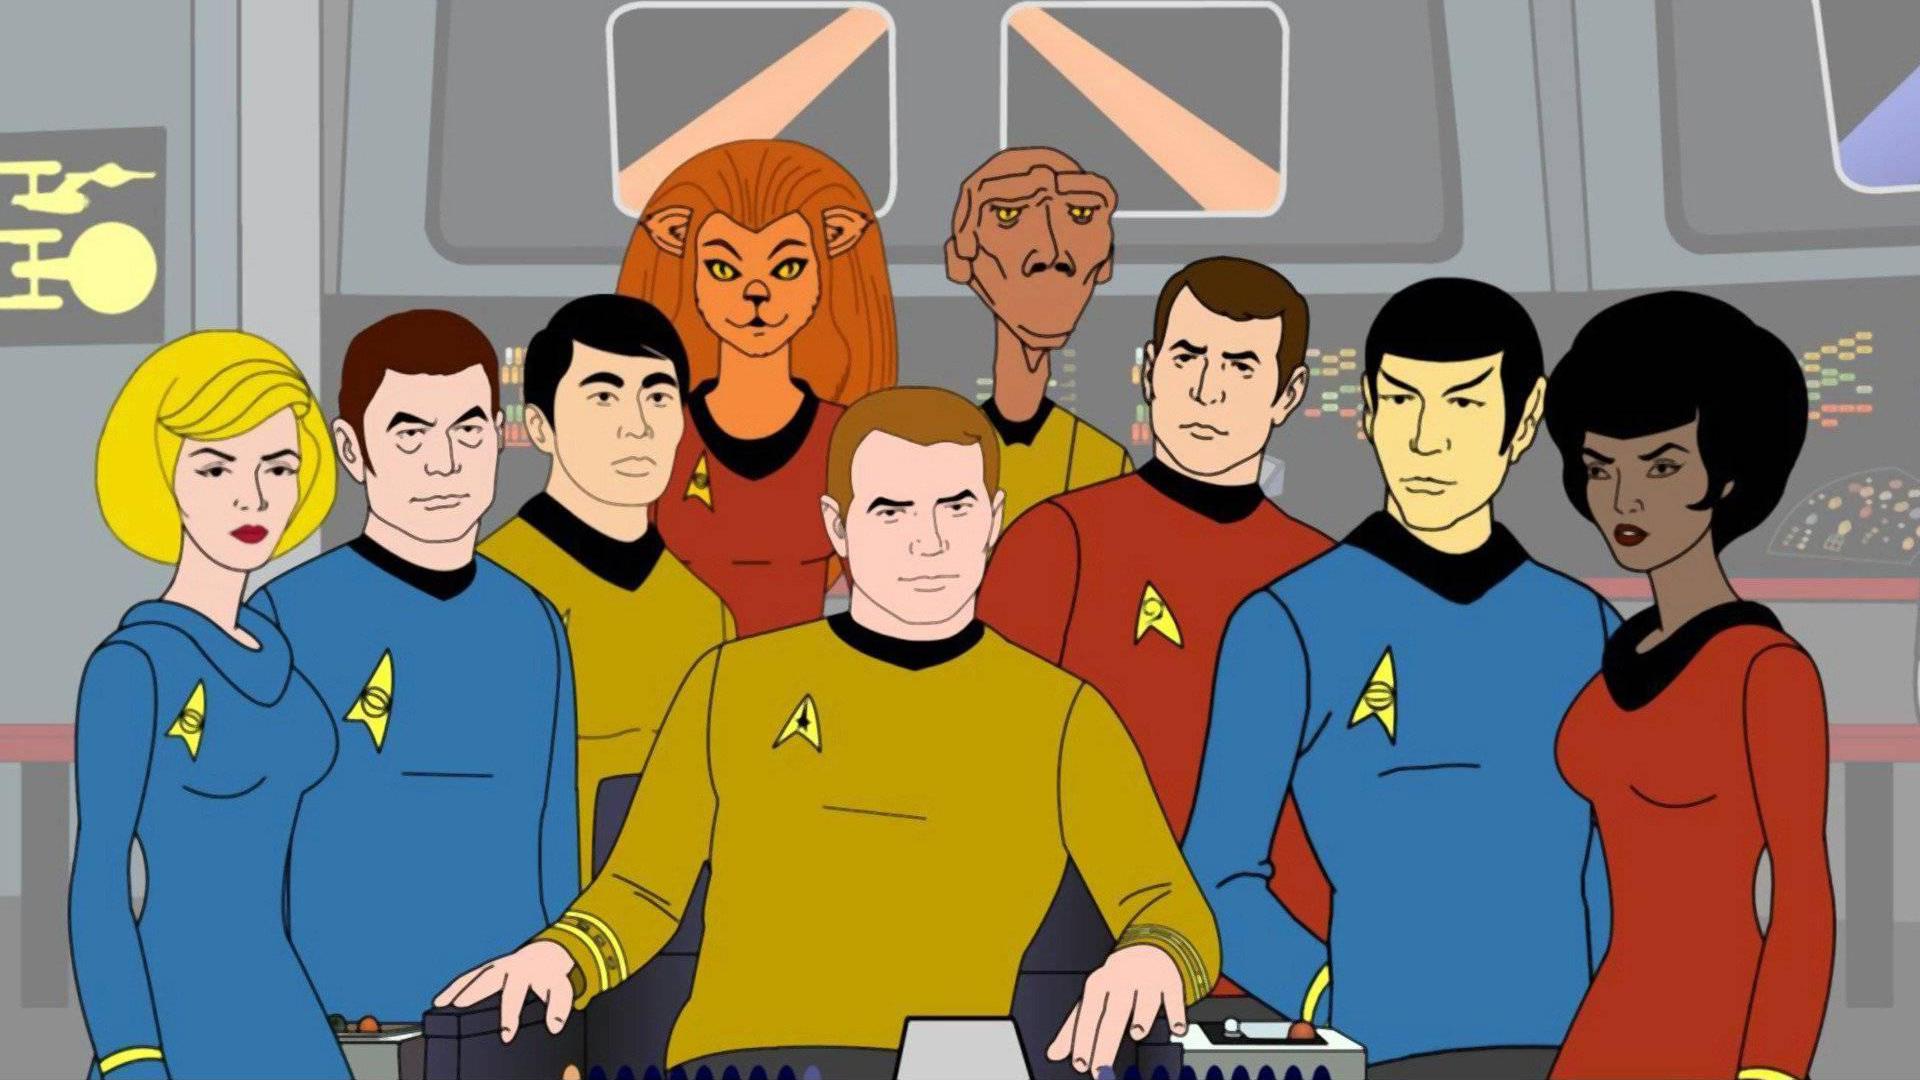 Star Trek: The Animated Series Wallpaper From The TV MegaSite